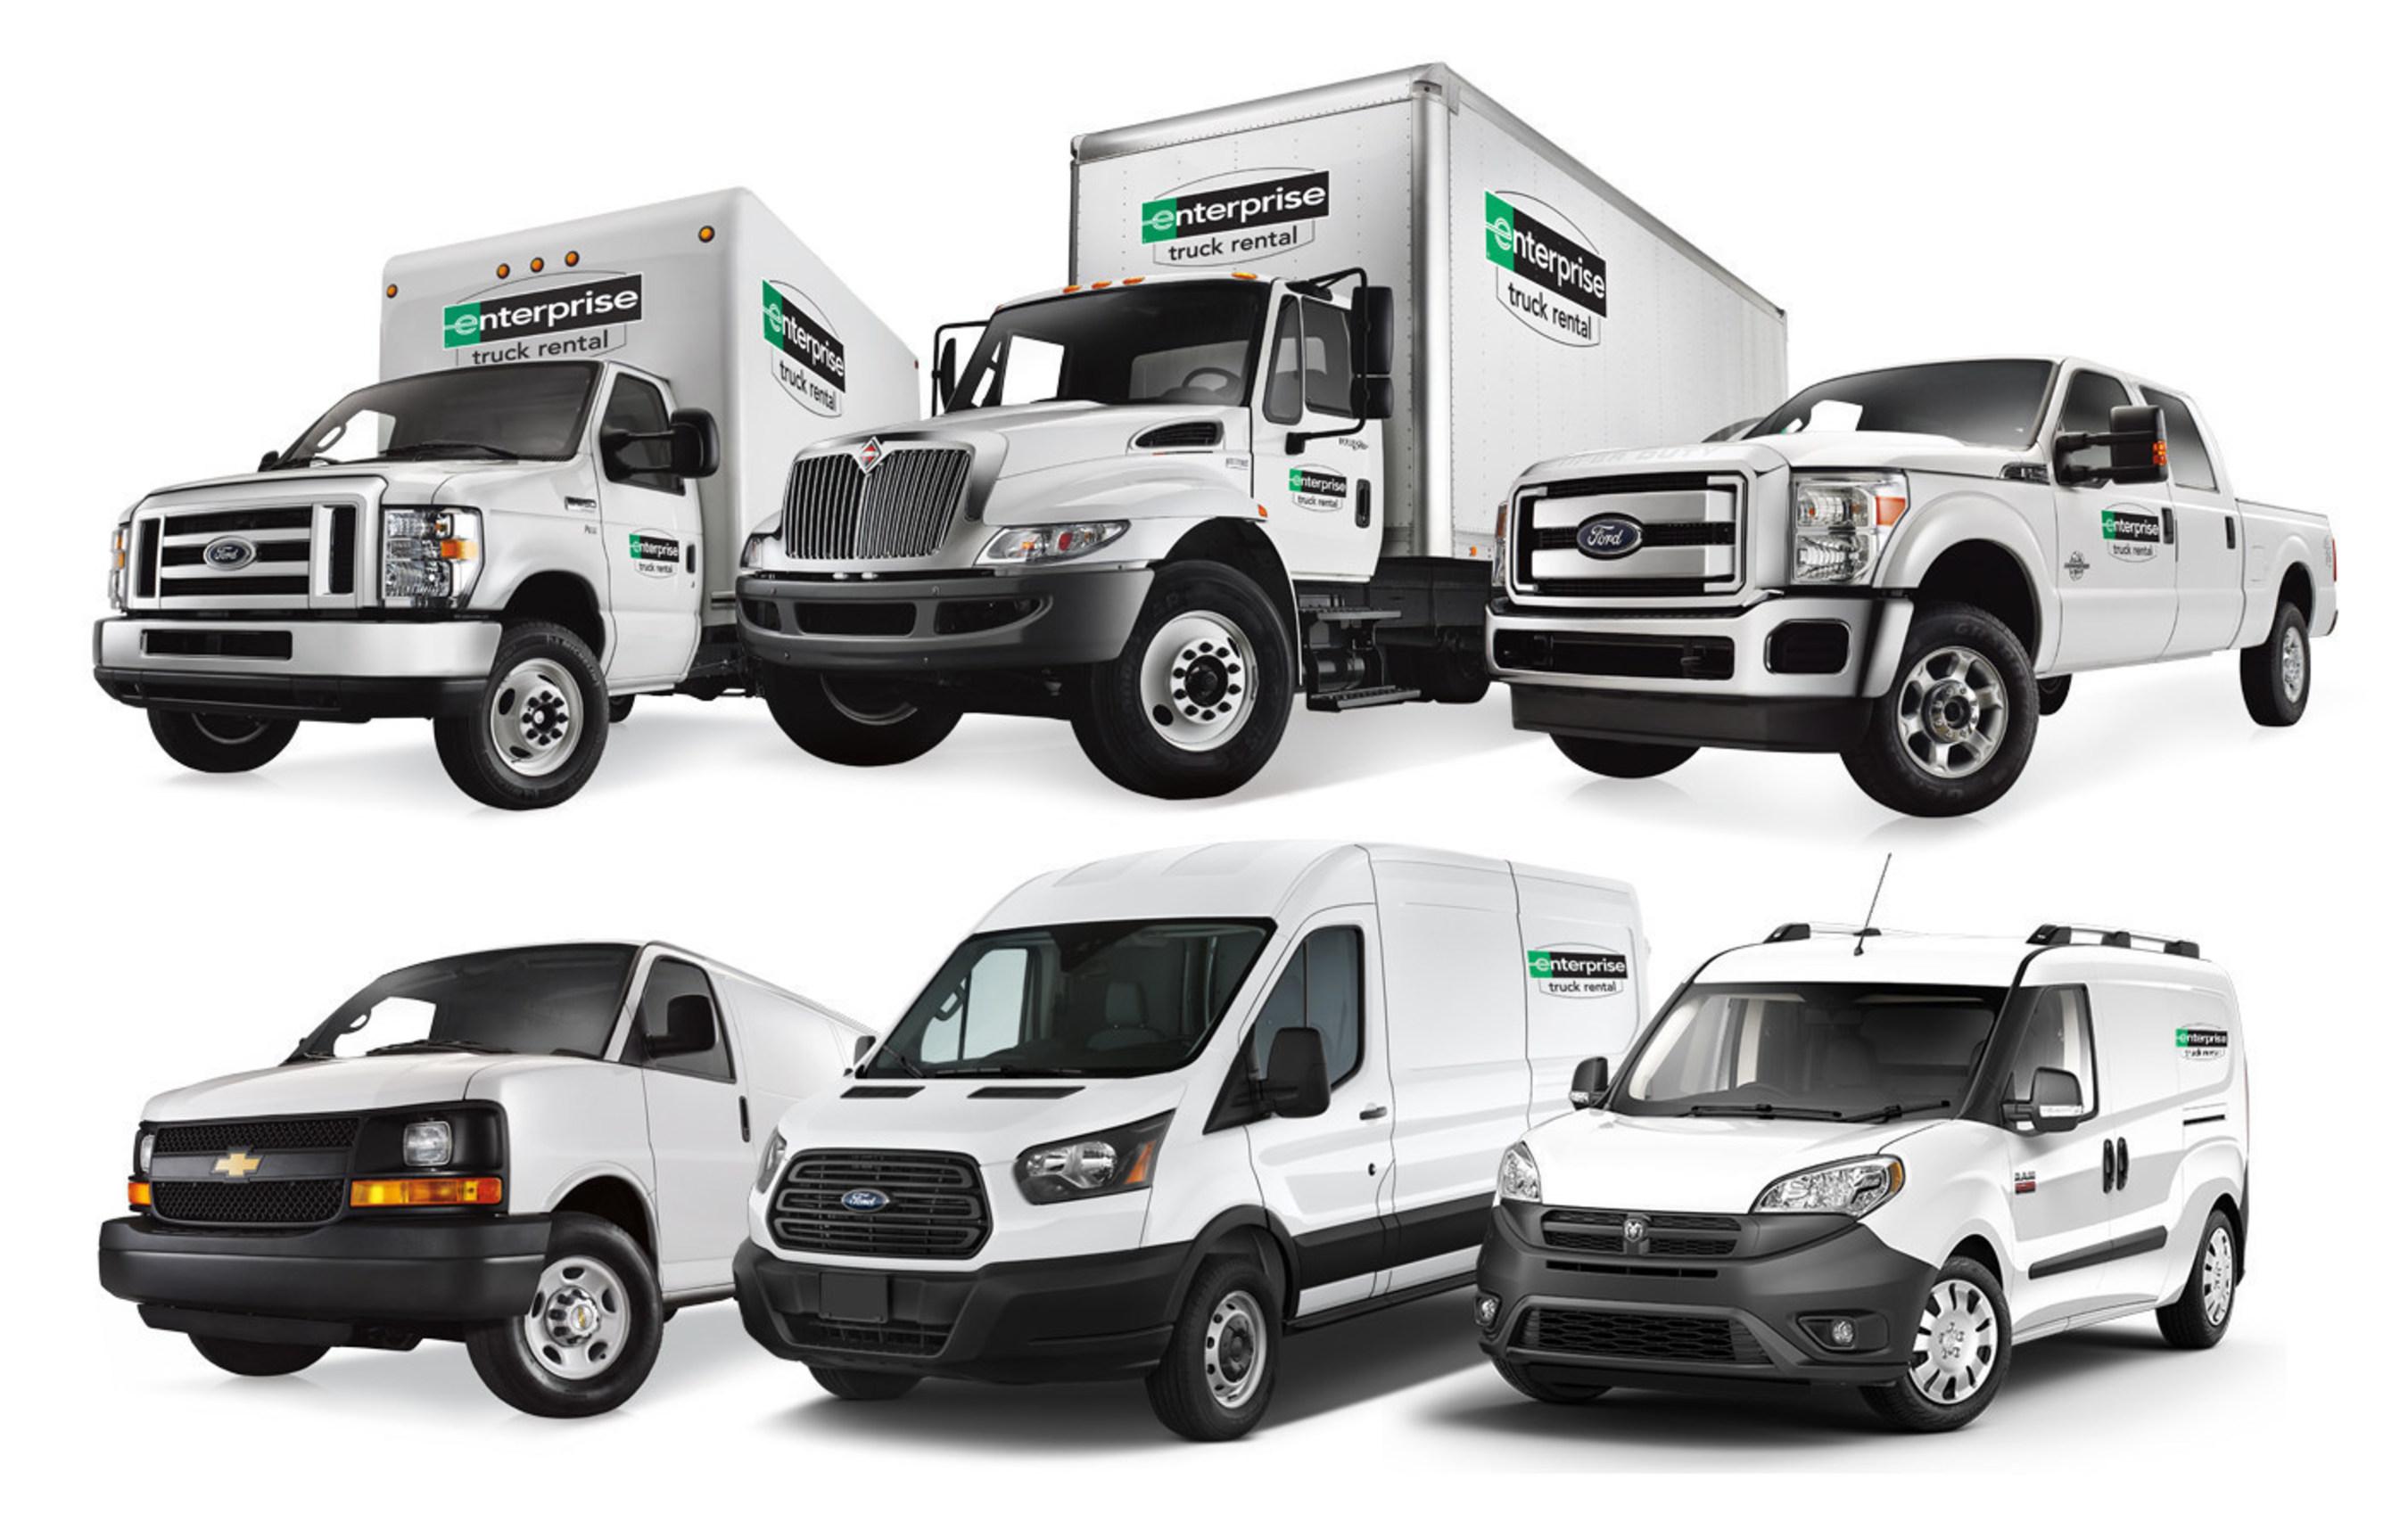 Pickup Truck Rental >> Enterprise Truck Rental Opens First Montana Location